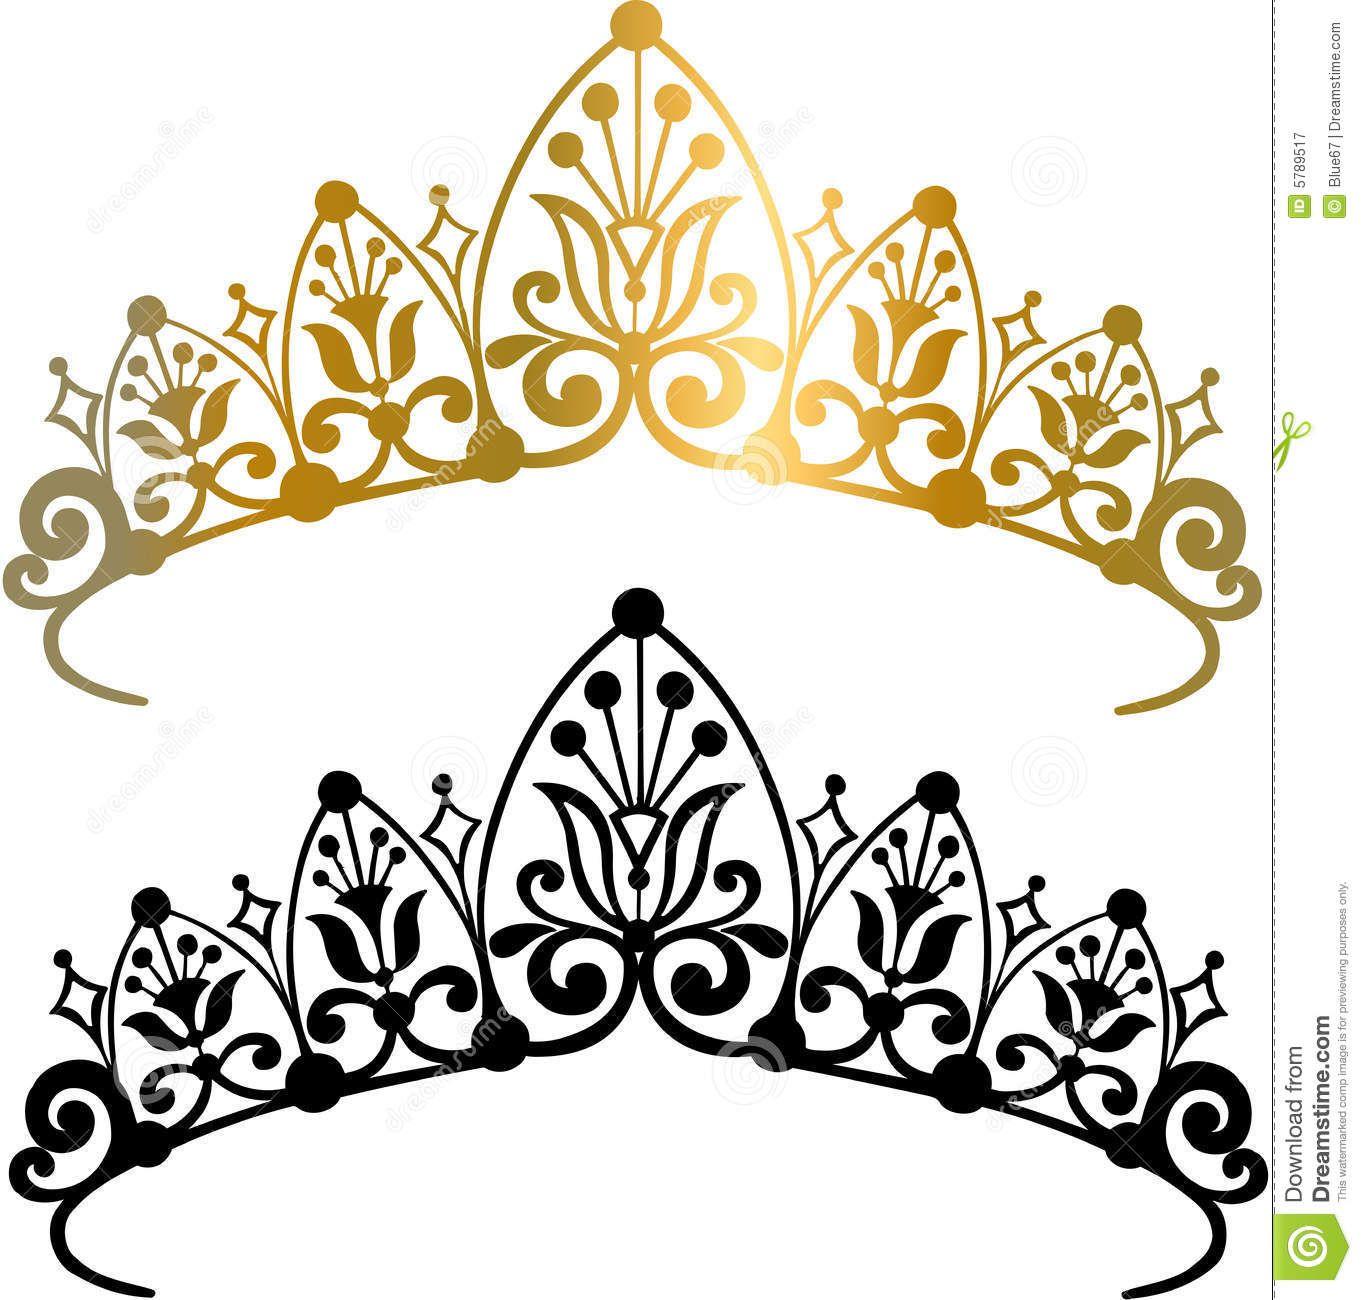 1362x1300 Resultado De Imagen Para Corona Vector Coronas En Porcelana Fria